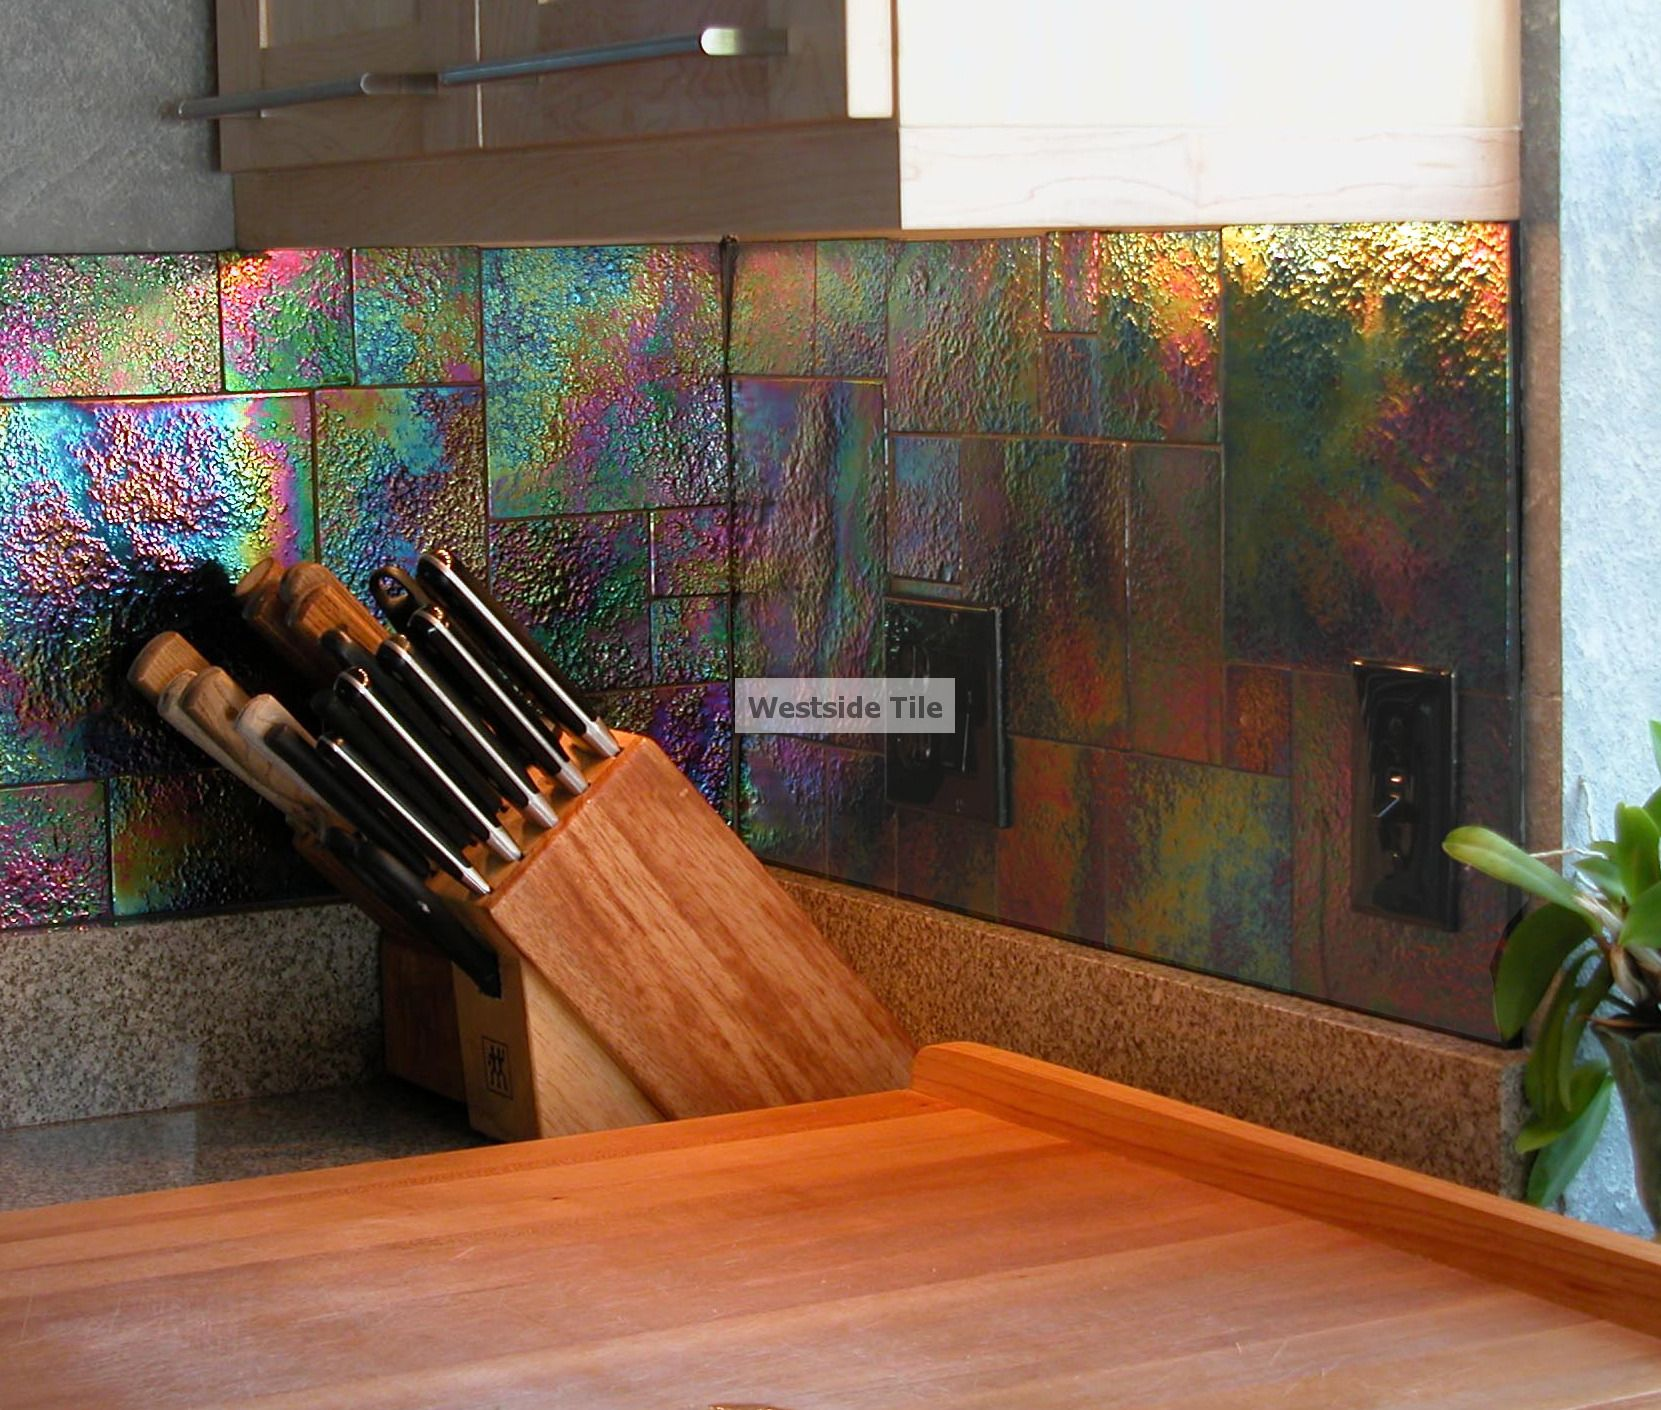 oceanside glass tile raku iridescent kitchen backsplash kitchen oceanside glass tile raku iridescent kitchen backsplash